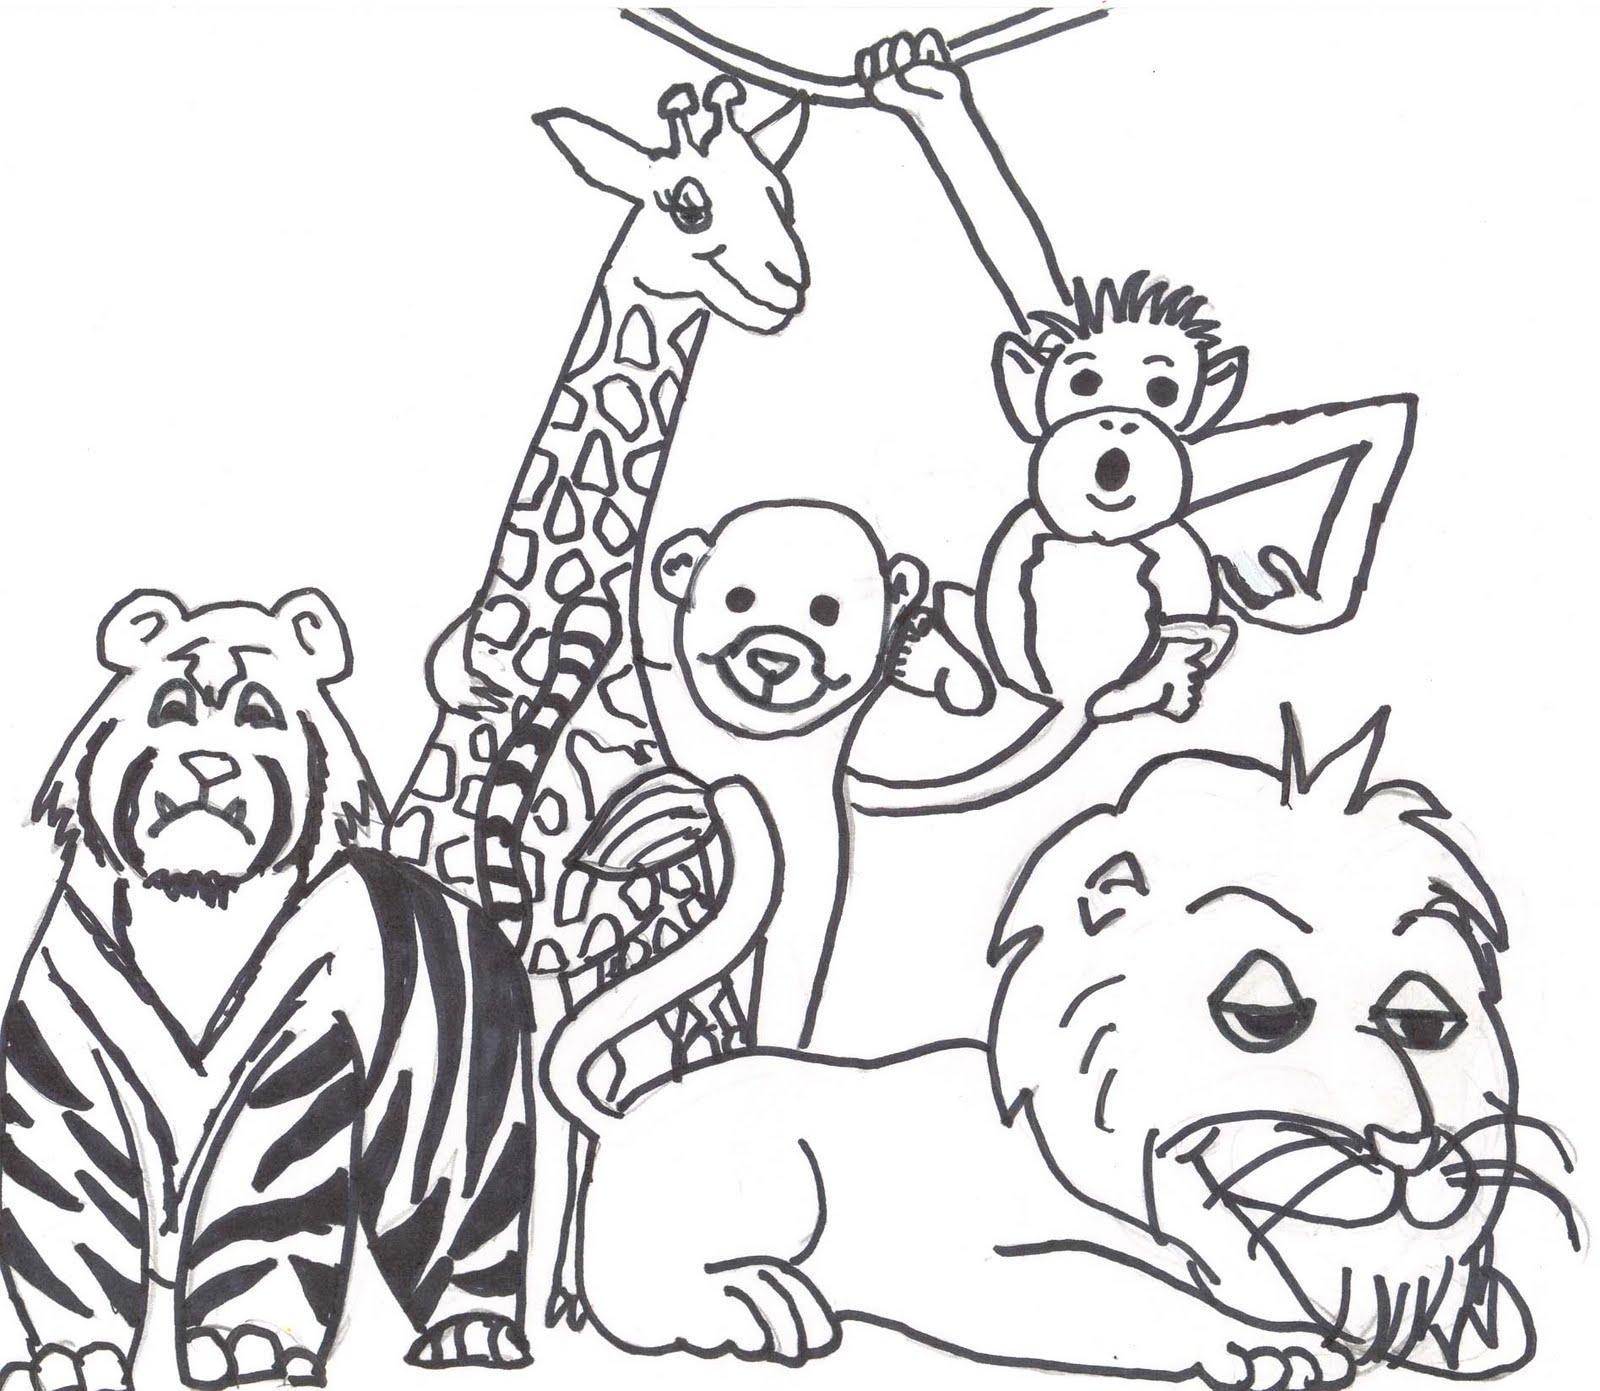 1600x1391 Favorite Things Karen Goes To The Zoo